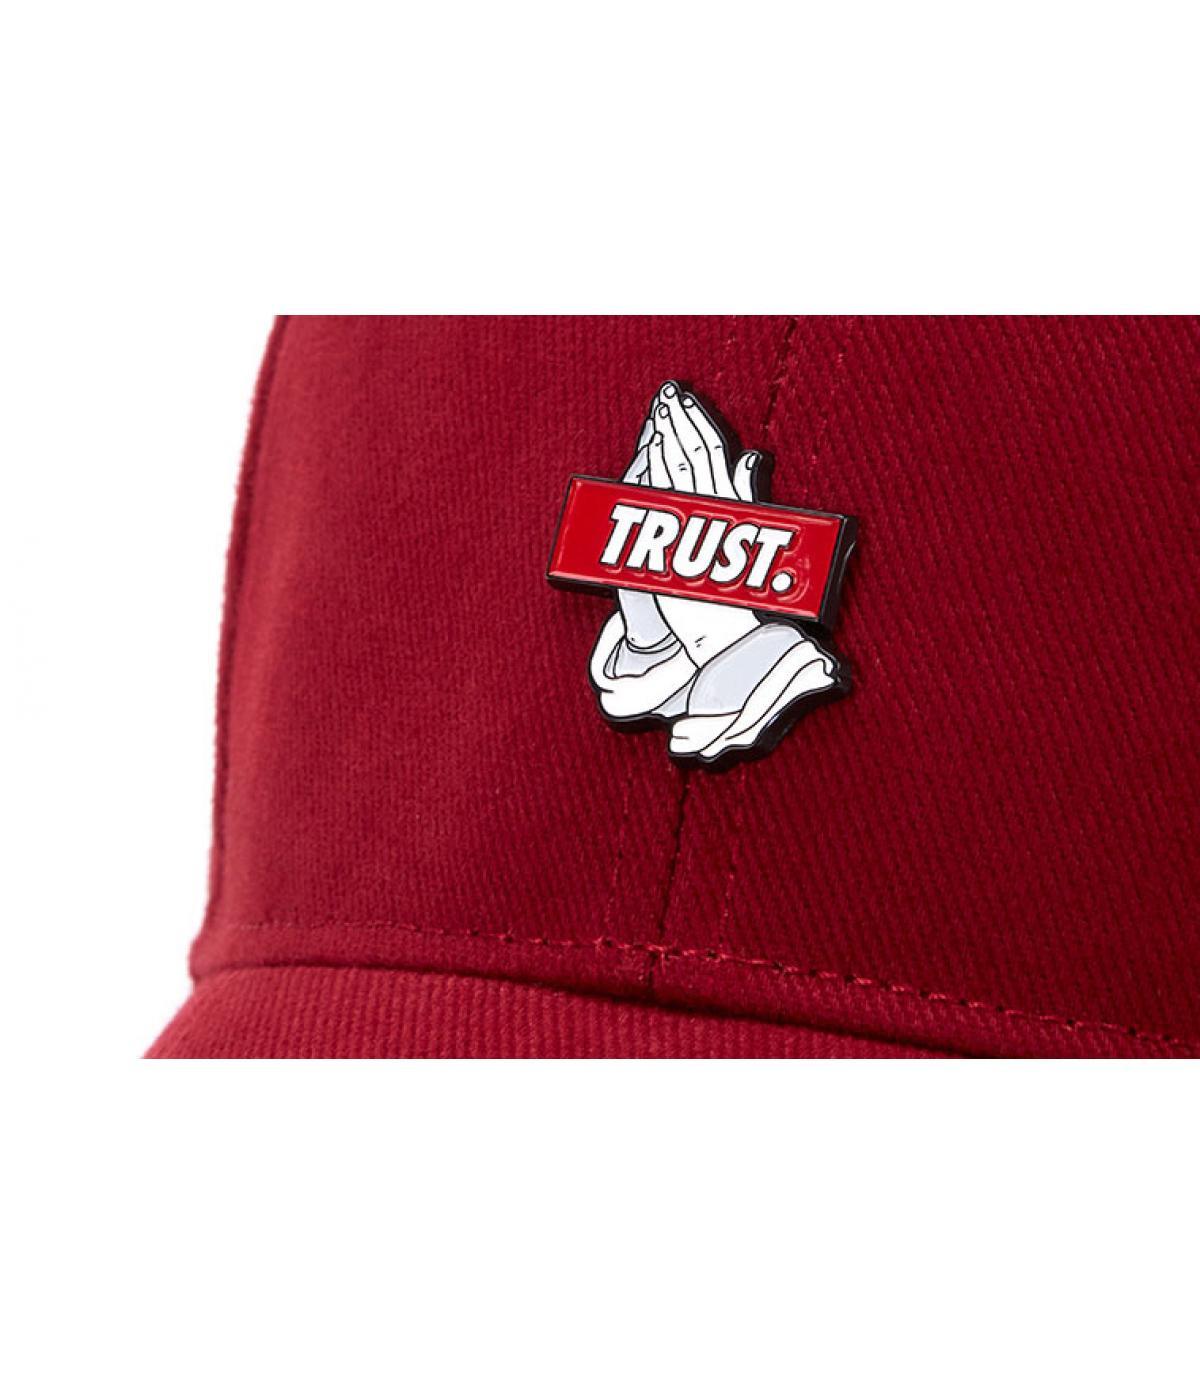 Détails Trust Curved maroon - image 3